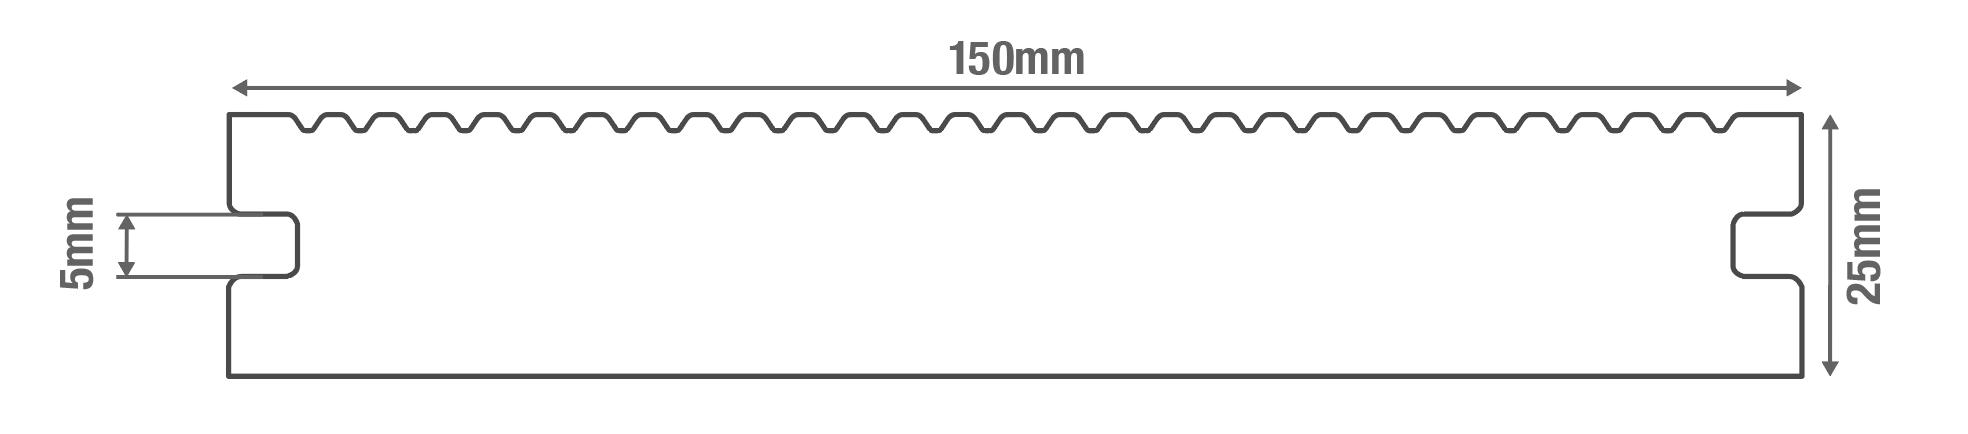 Solid Commercial Board Diagram